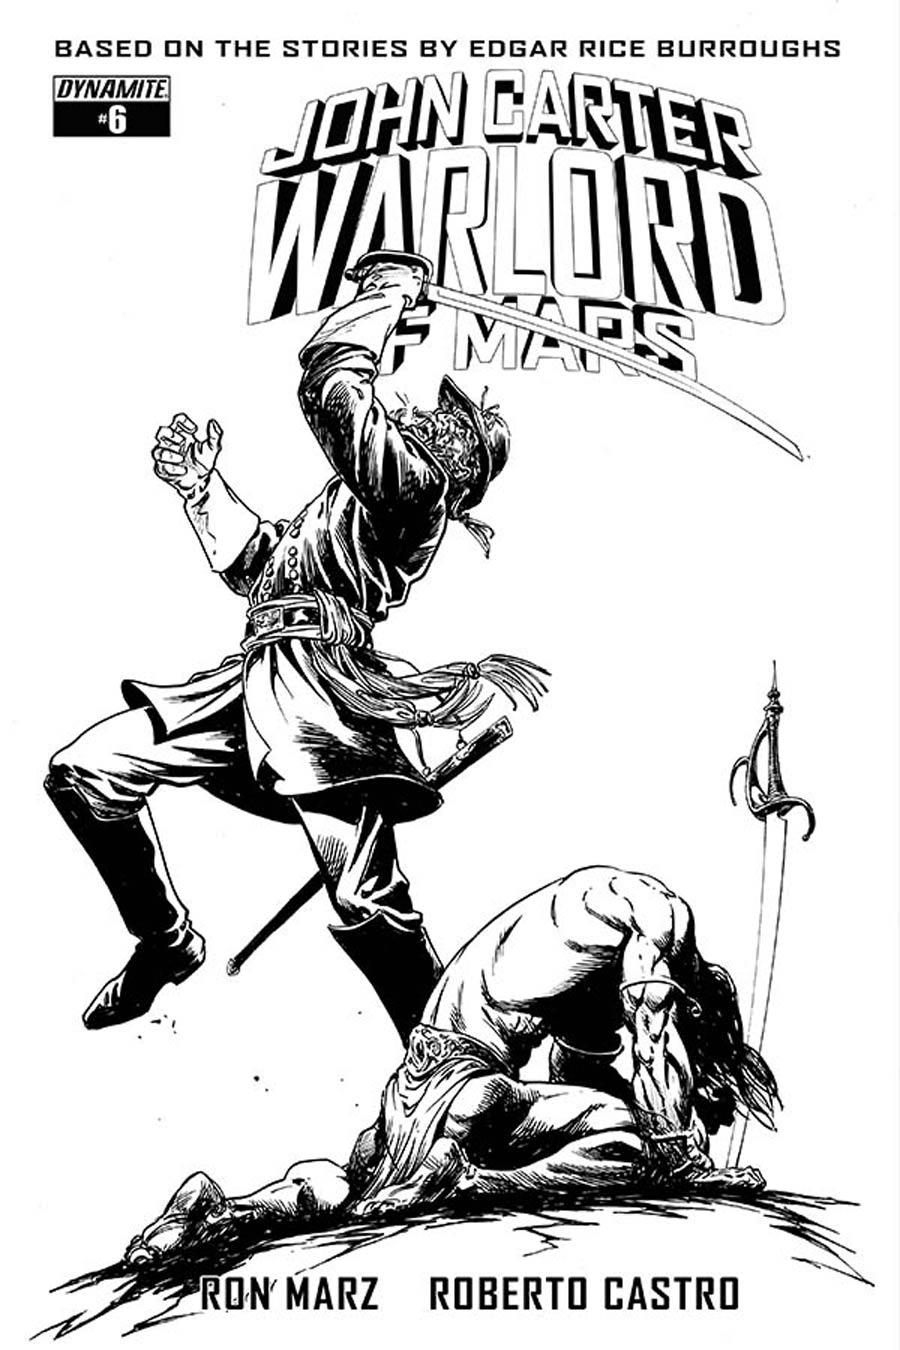 John Carter Warlord Of Mars Vol 2 #6 Cover E Incentive Bart Sears Black & White Cover